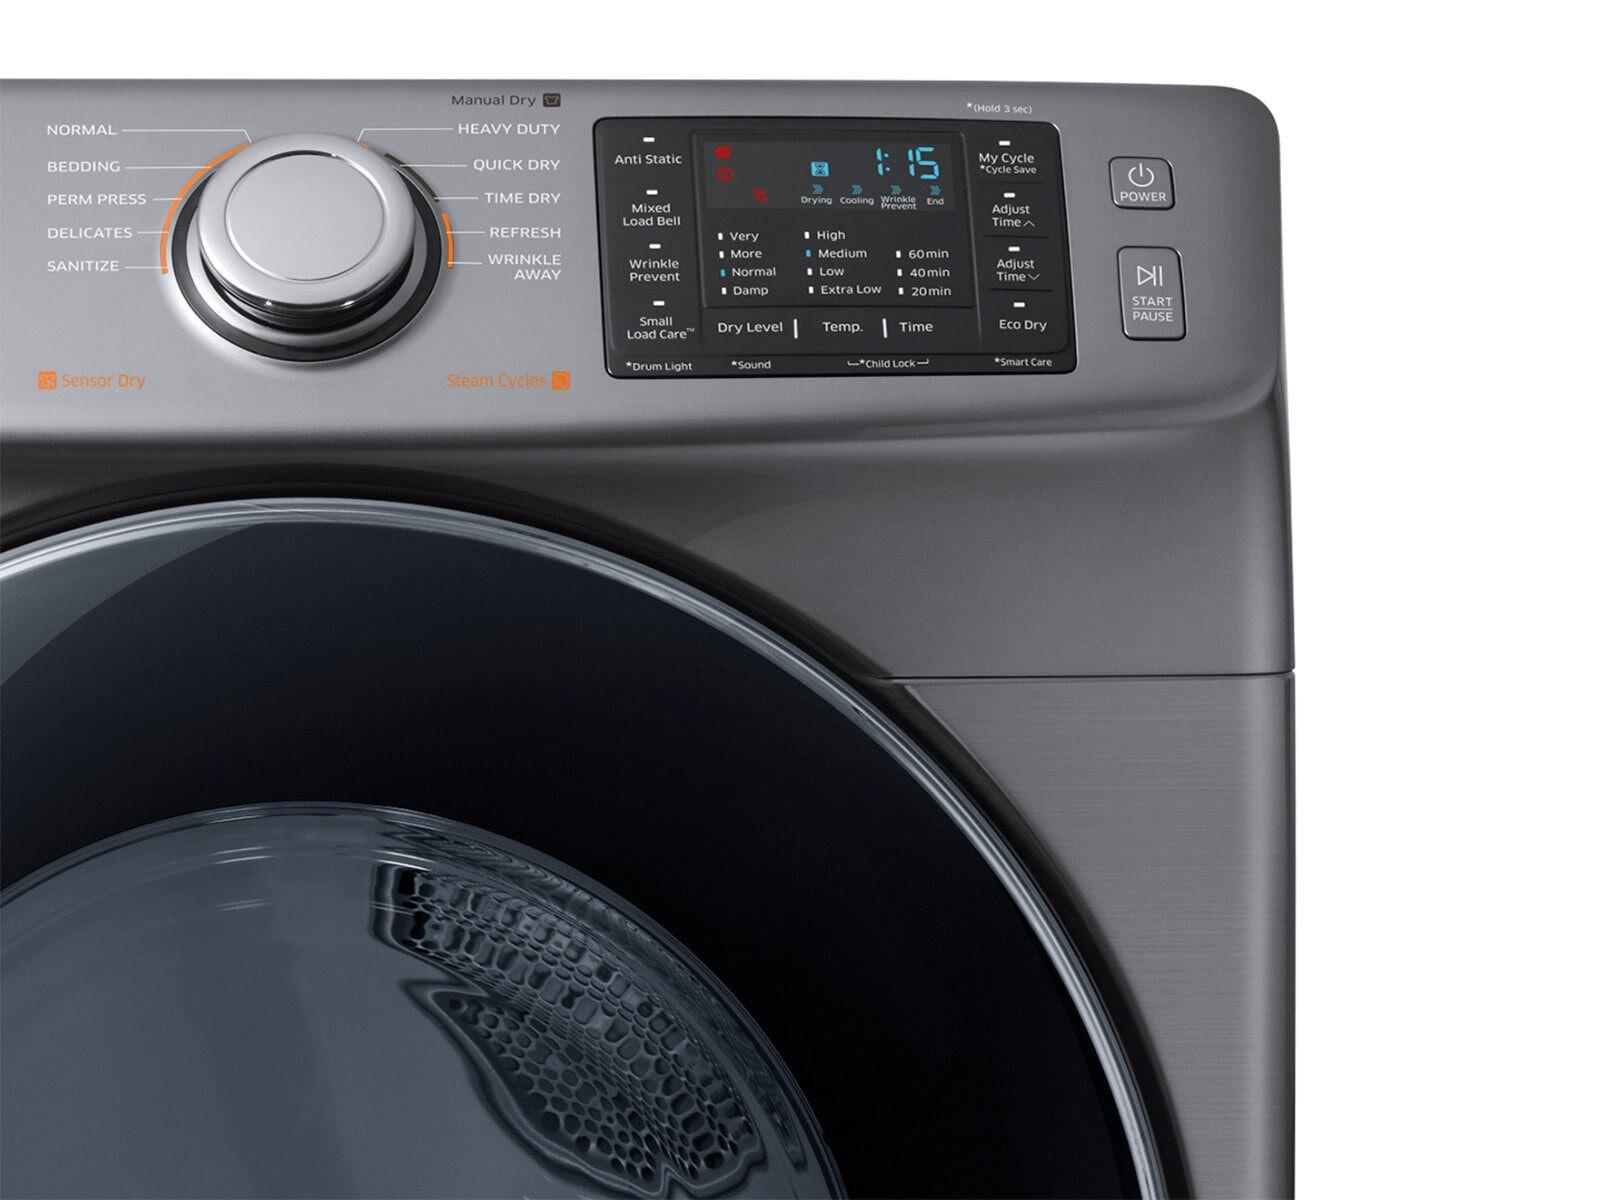 Samsung Appliances Washers Amp Dryers 4 5 Cu Ft Energy